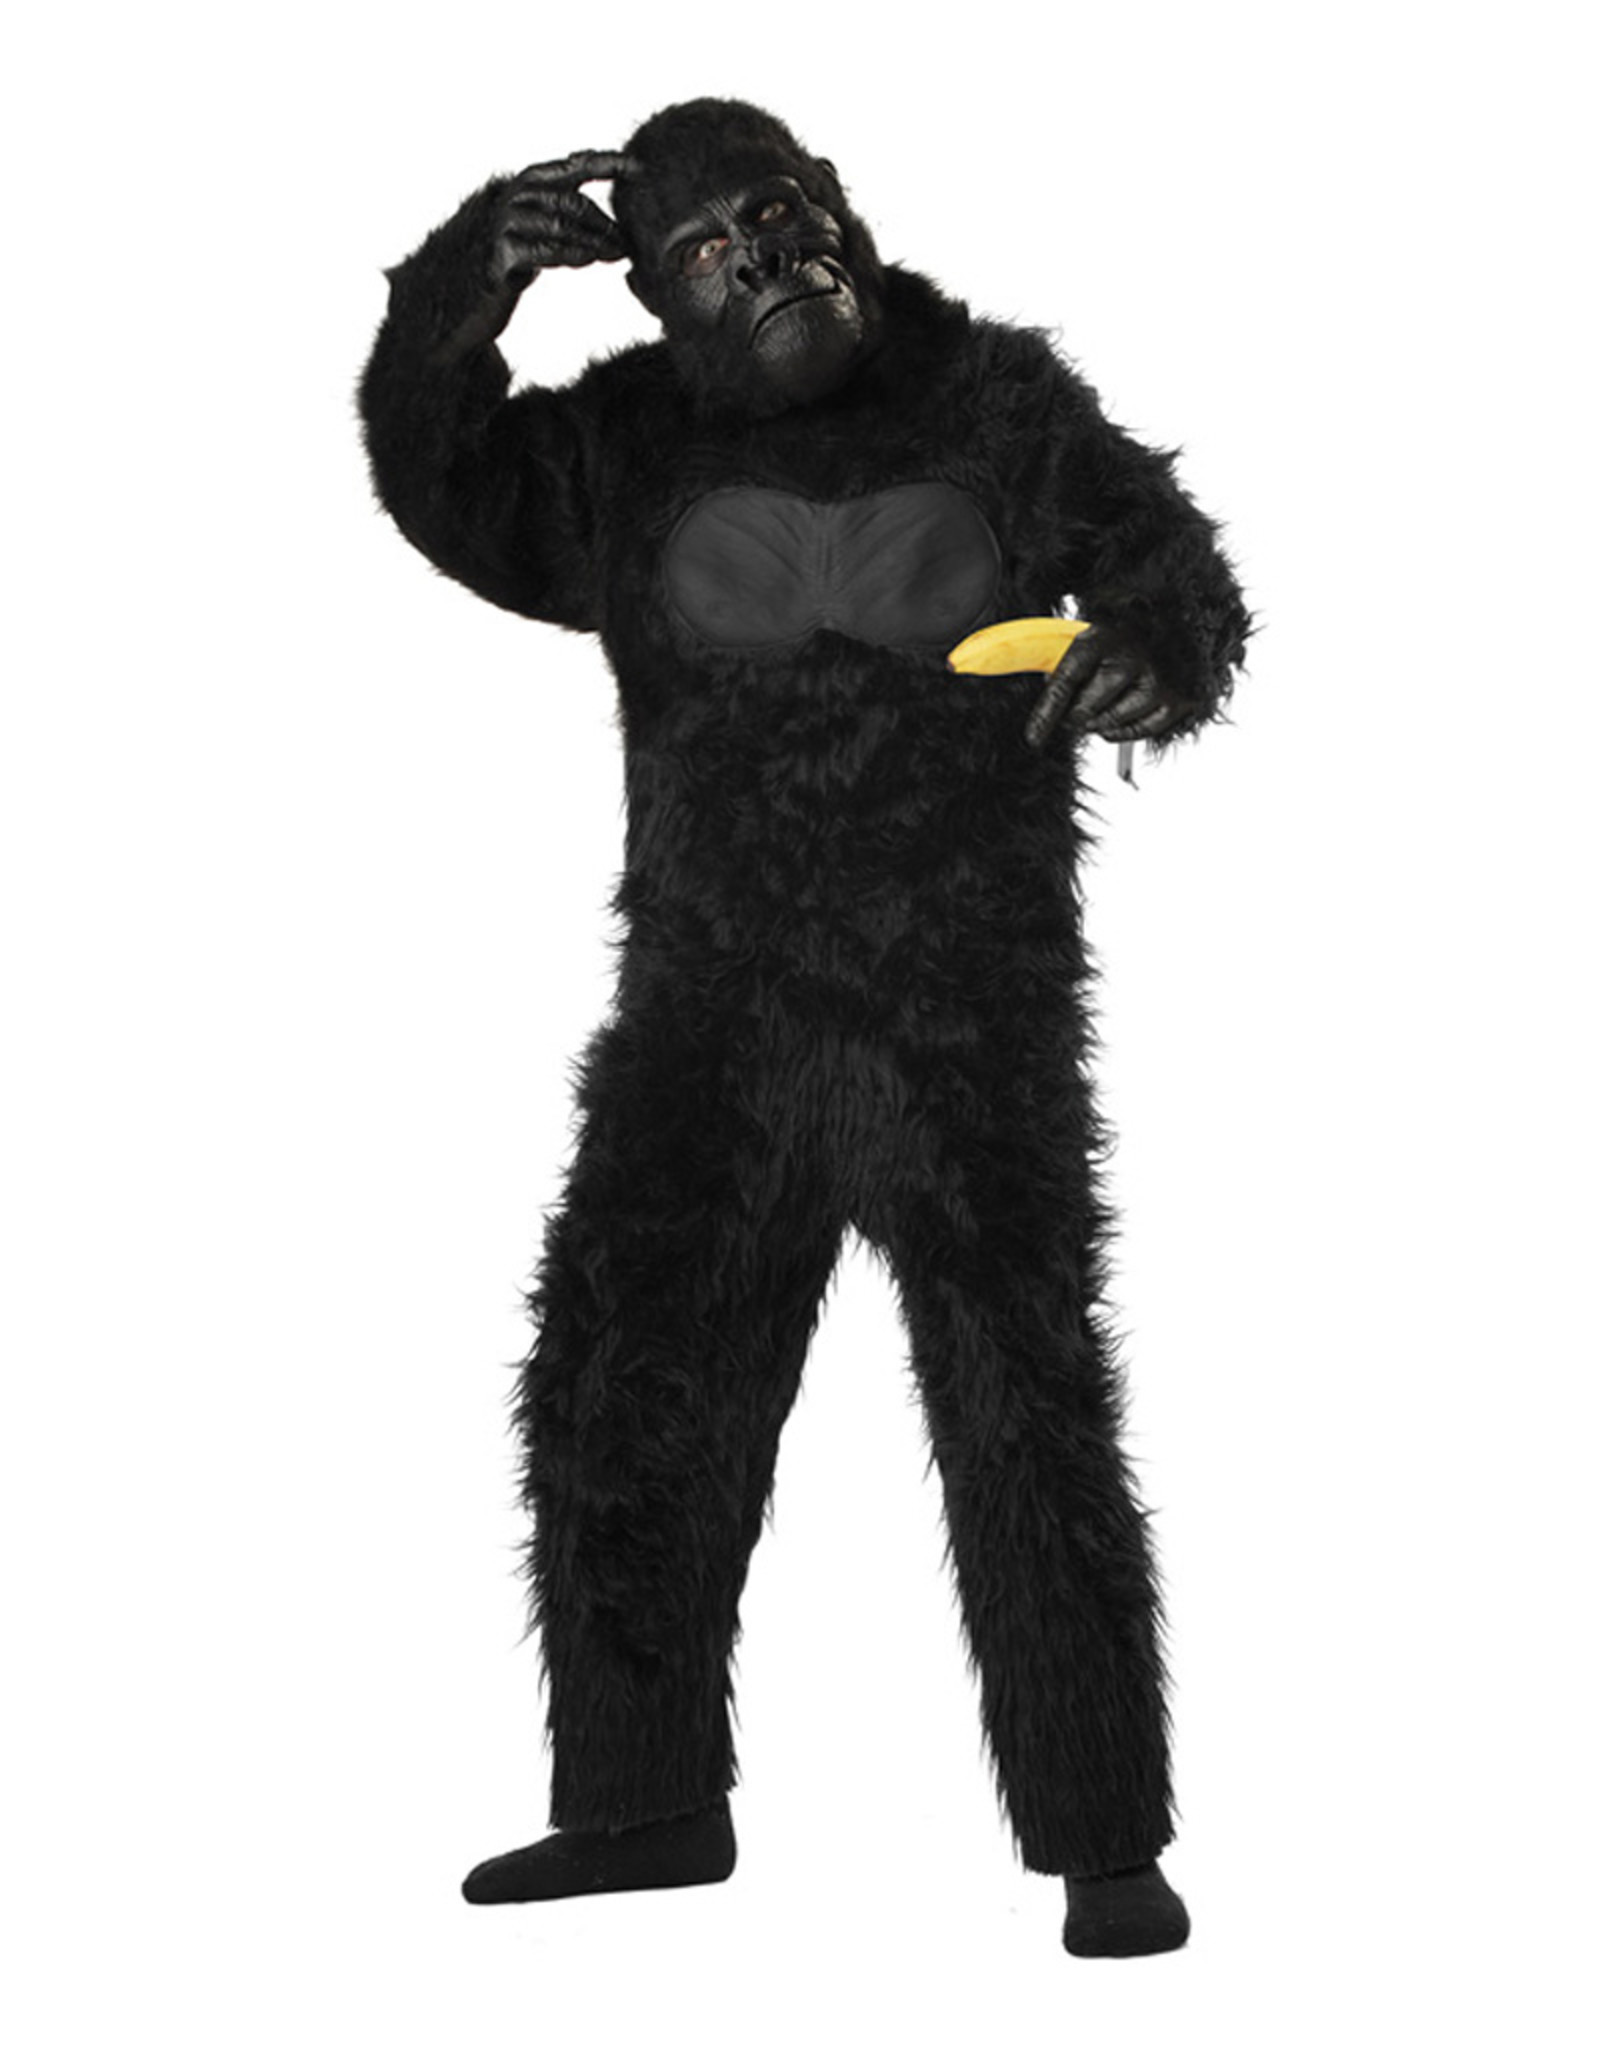 Gorilla Costume - Boys